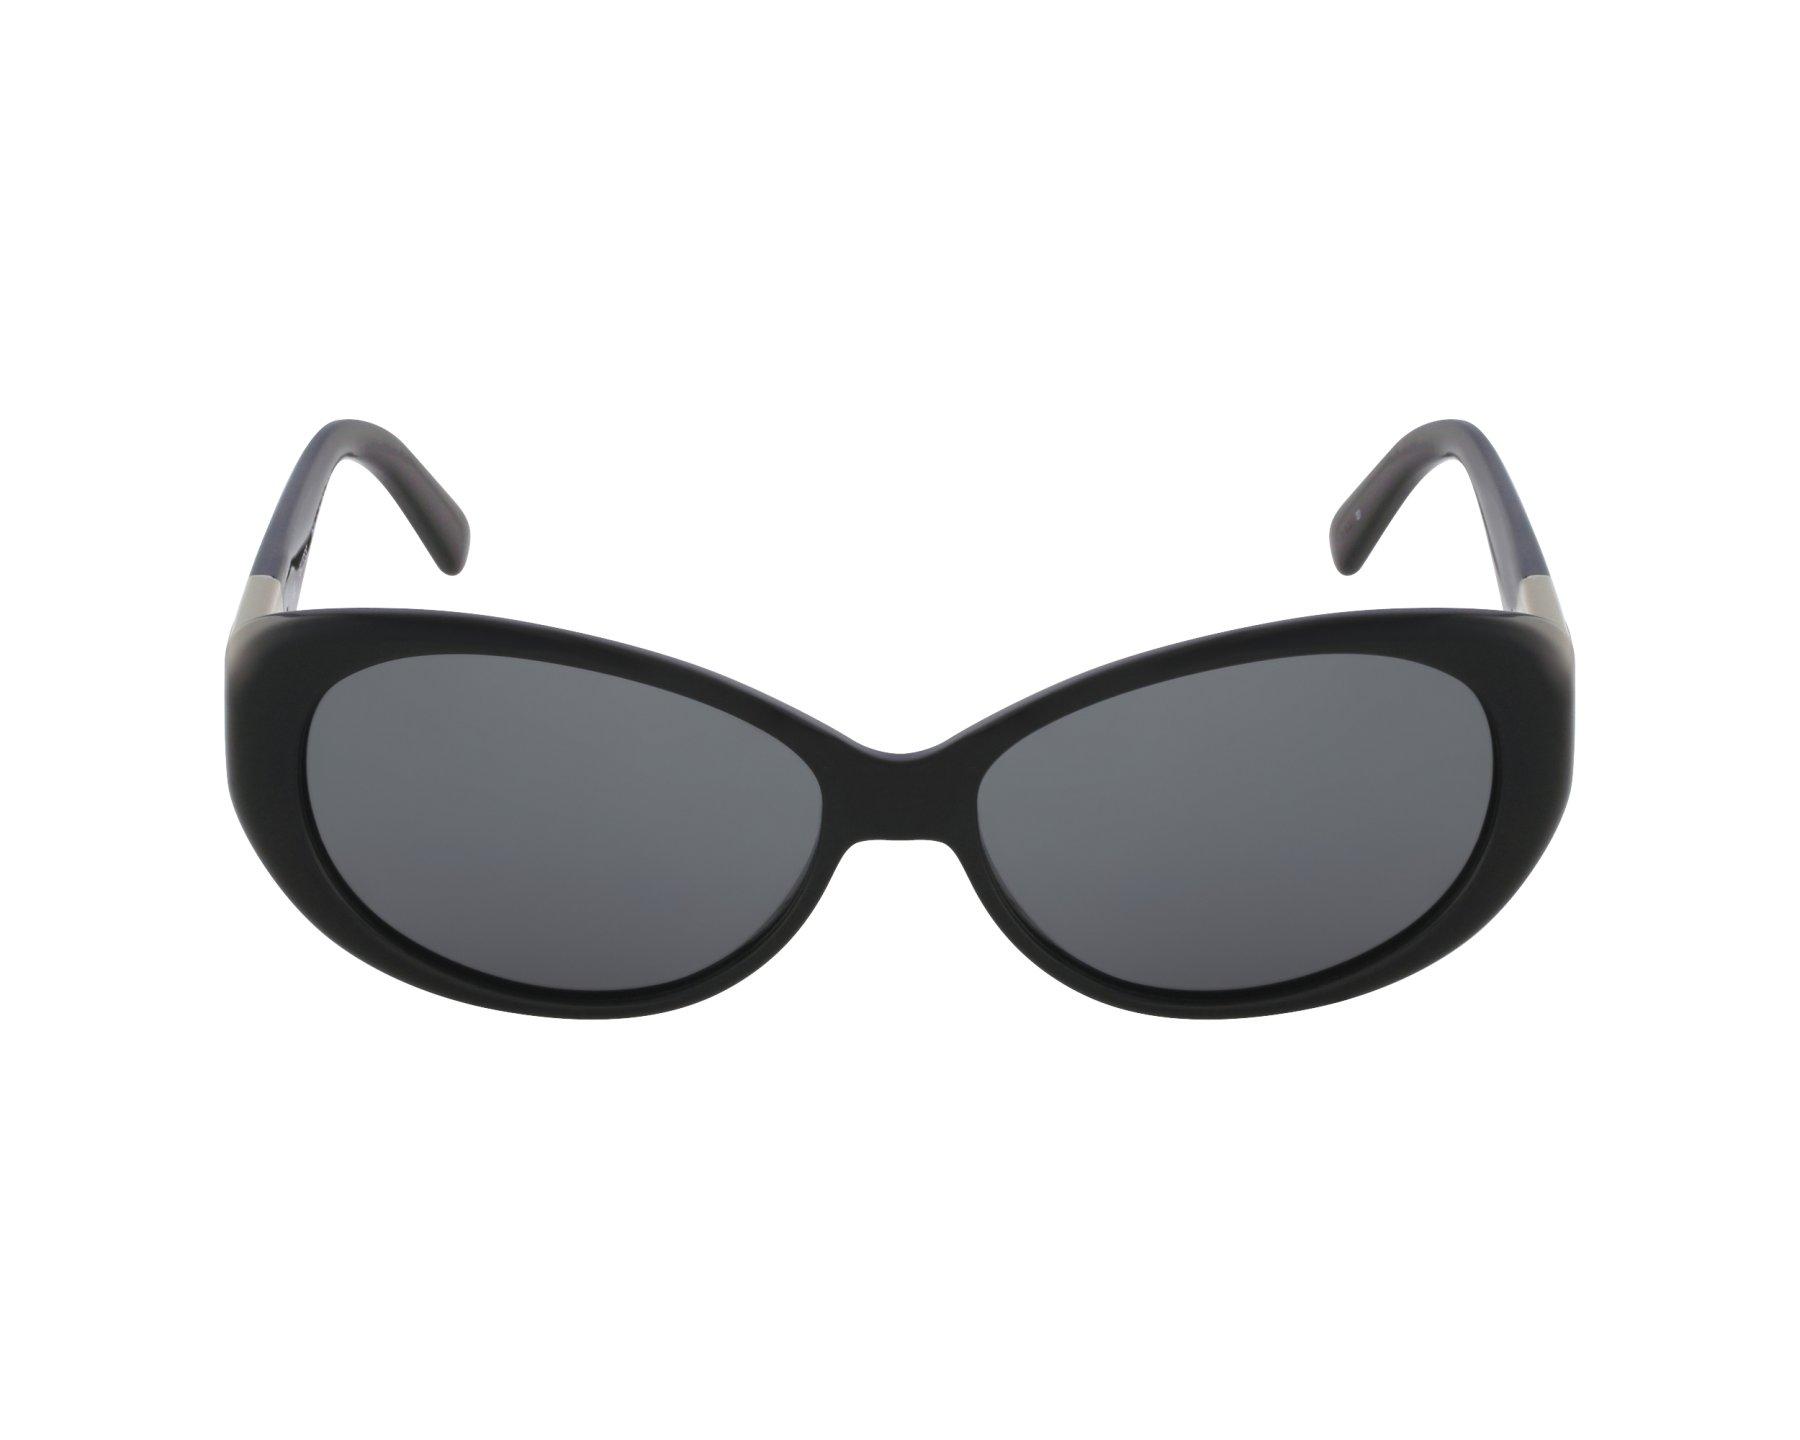 Blkgld Guess Sunglasses Gu 7261 3 O0kNPX8nwZ